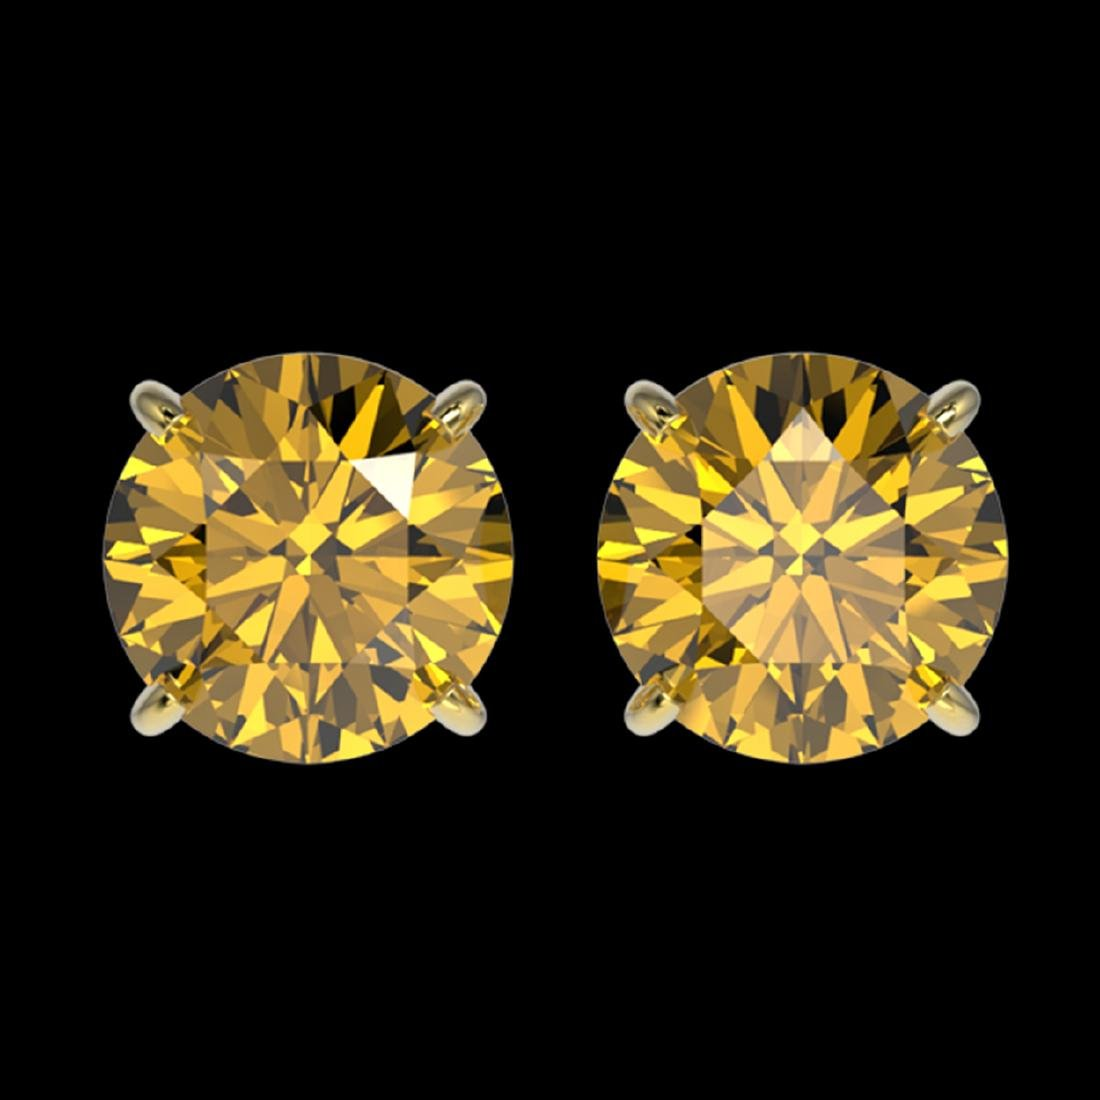 1.97 ctw Intense Yellow Diamond Stud Earrings 10K